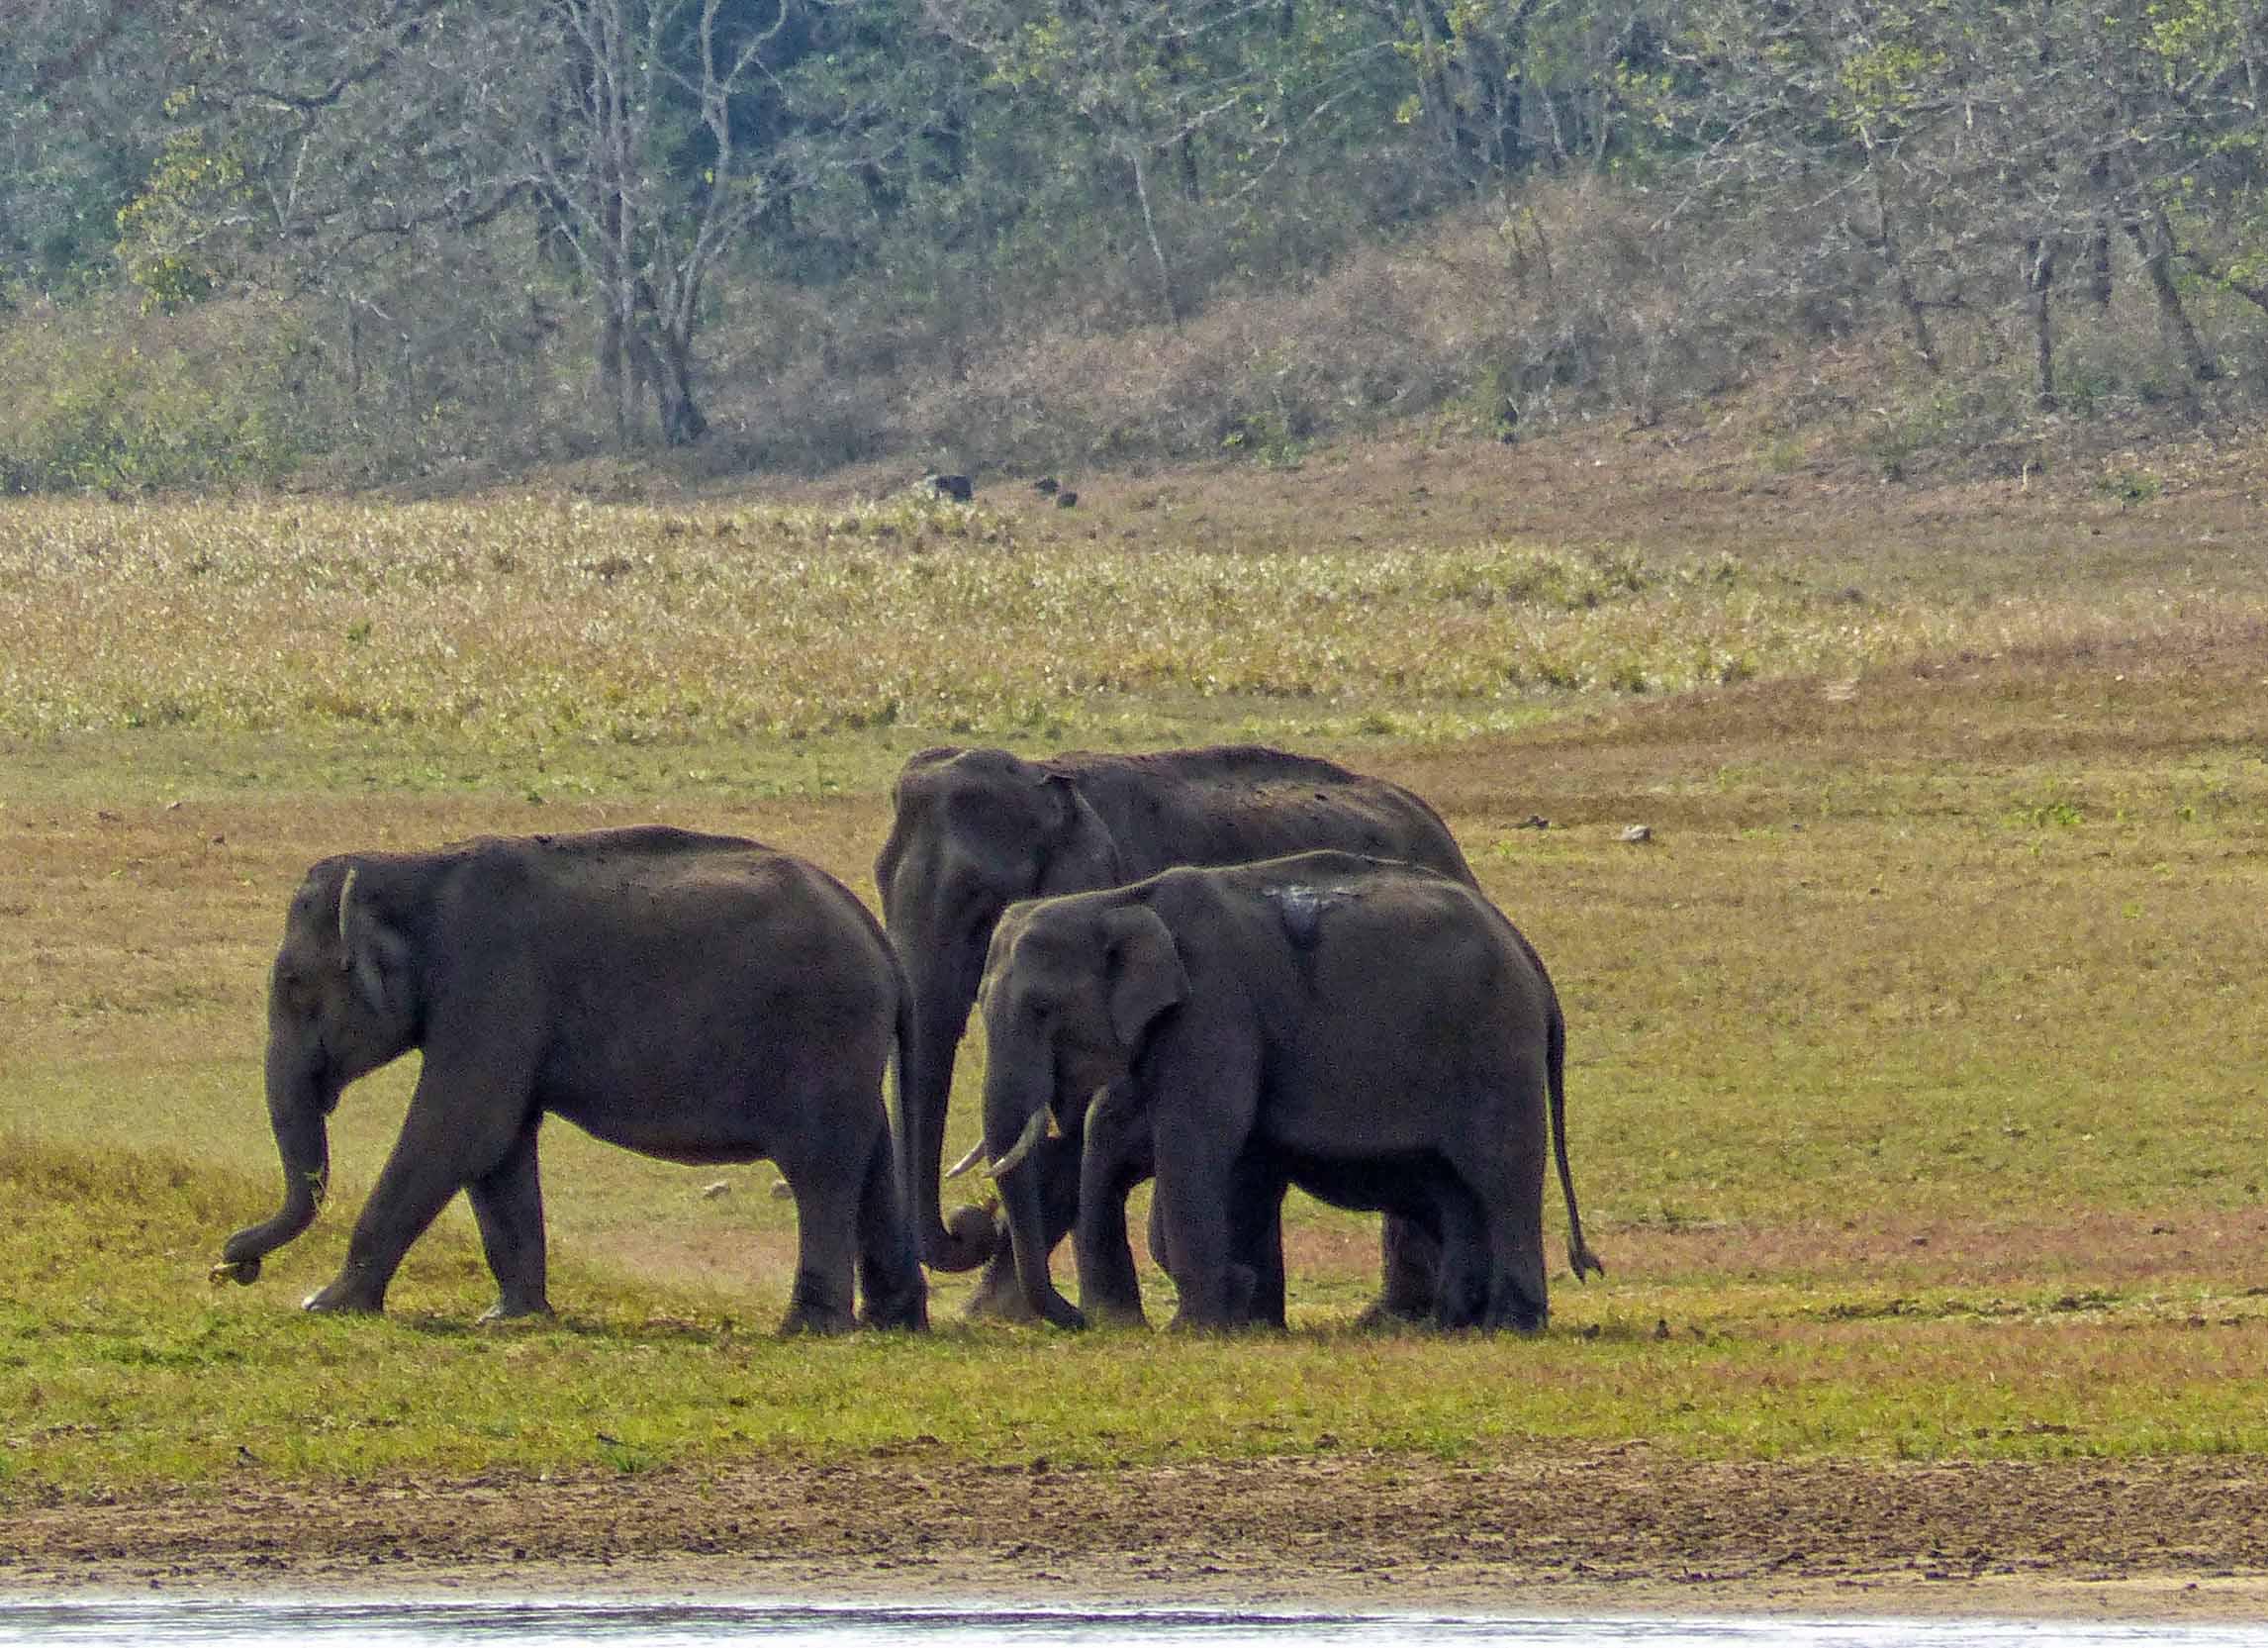 Group of three elephants